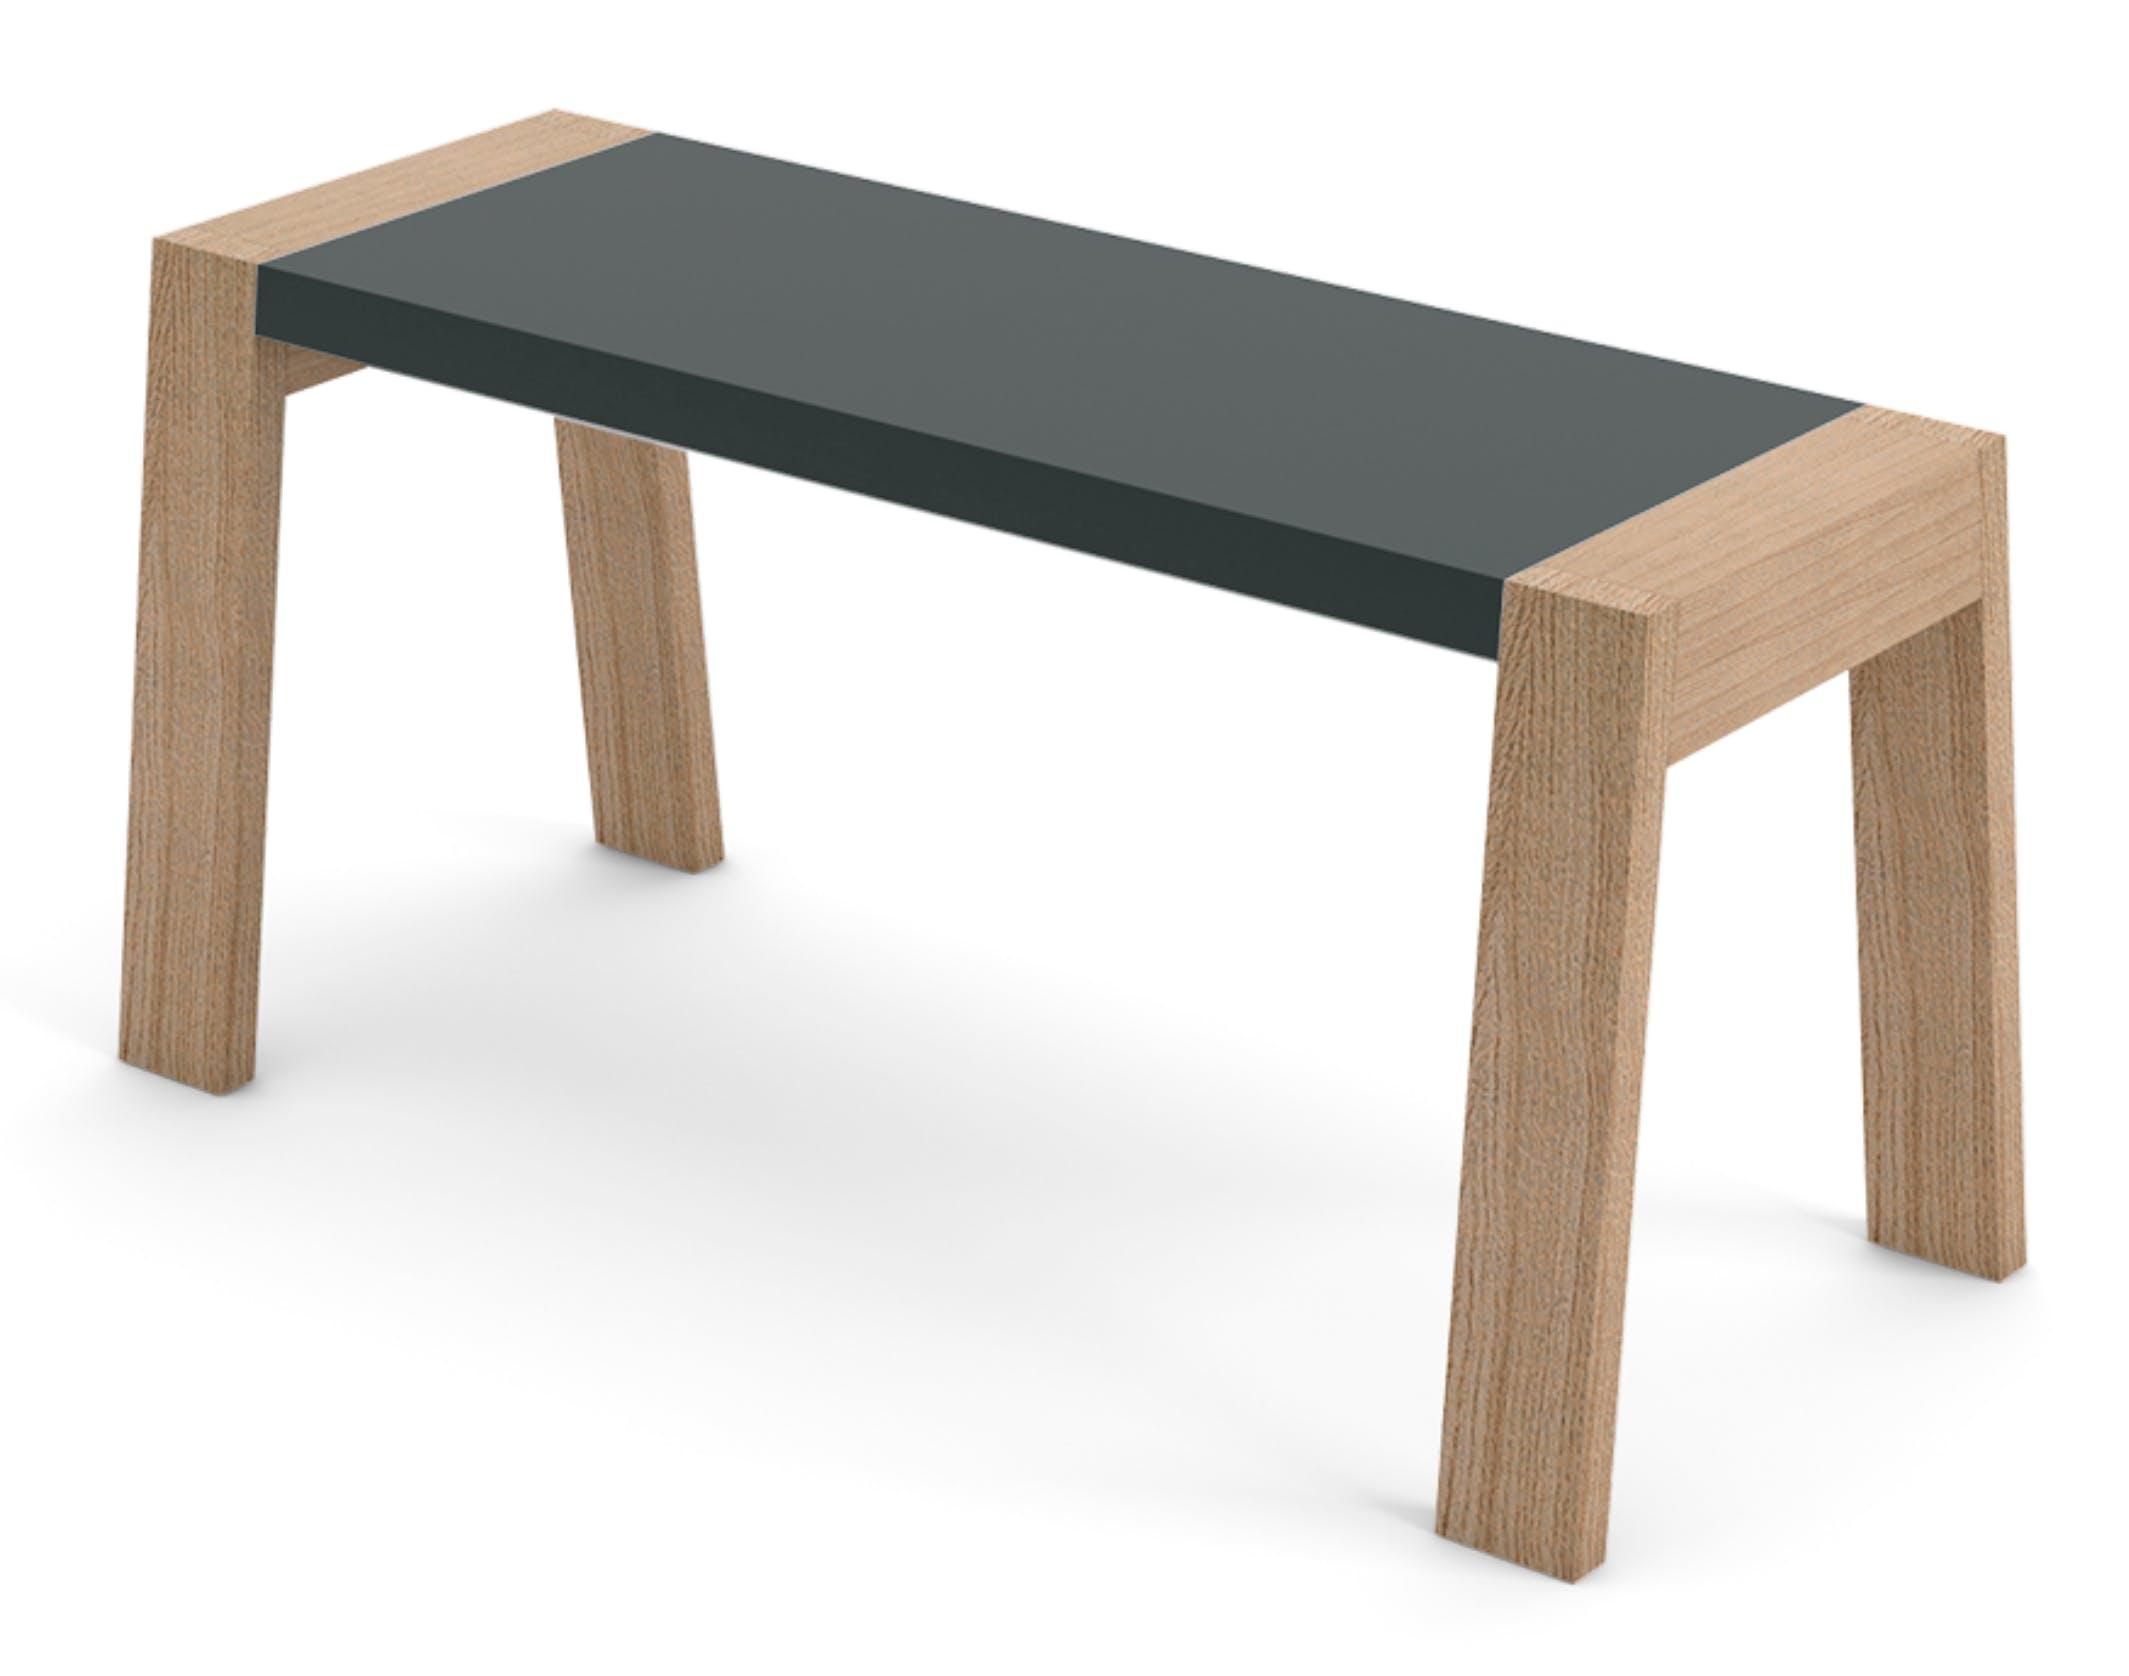 Punt Furniture Flak Bench Thumb Haute Living 181214 184941